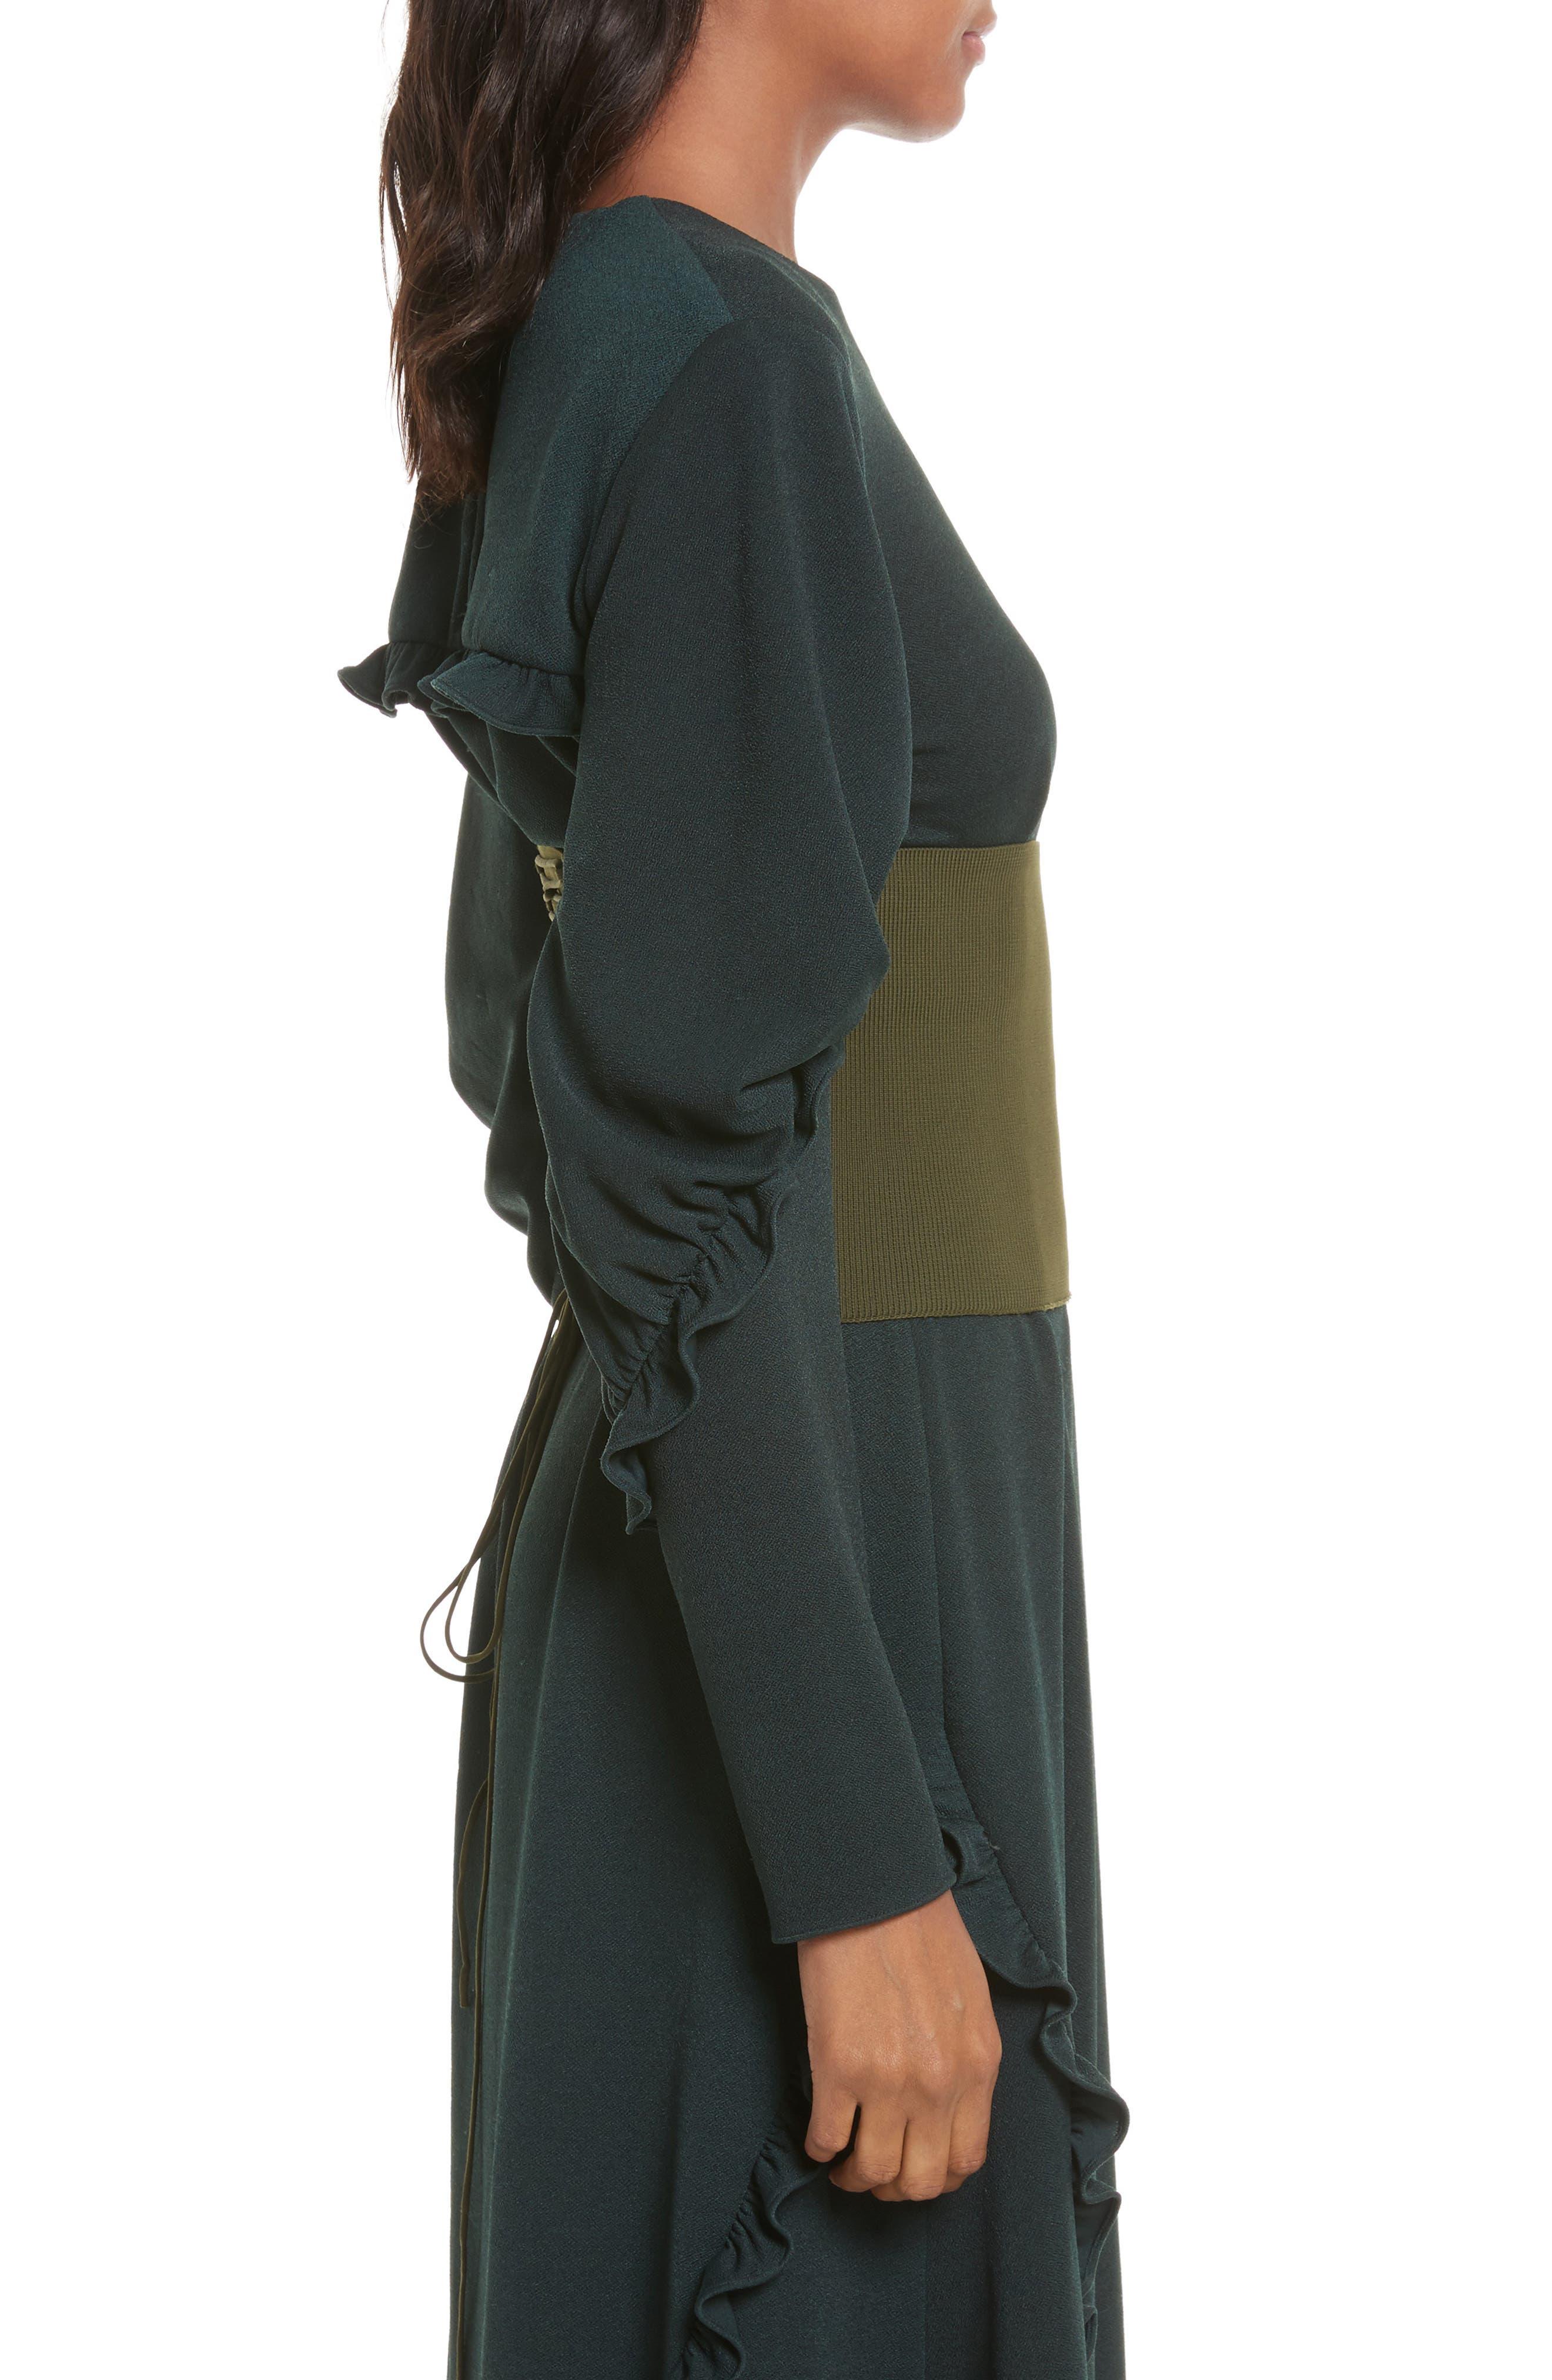 Lace-Up Knit Corset,                             Alternate thumbnail 3, color,                             Loden